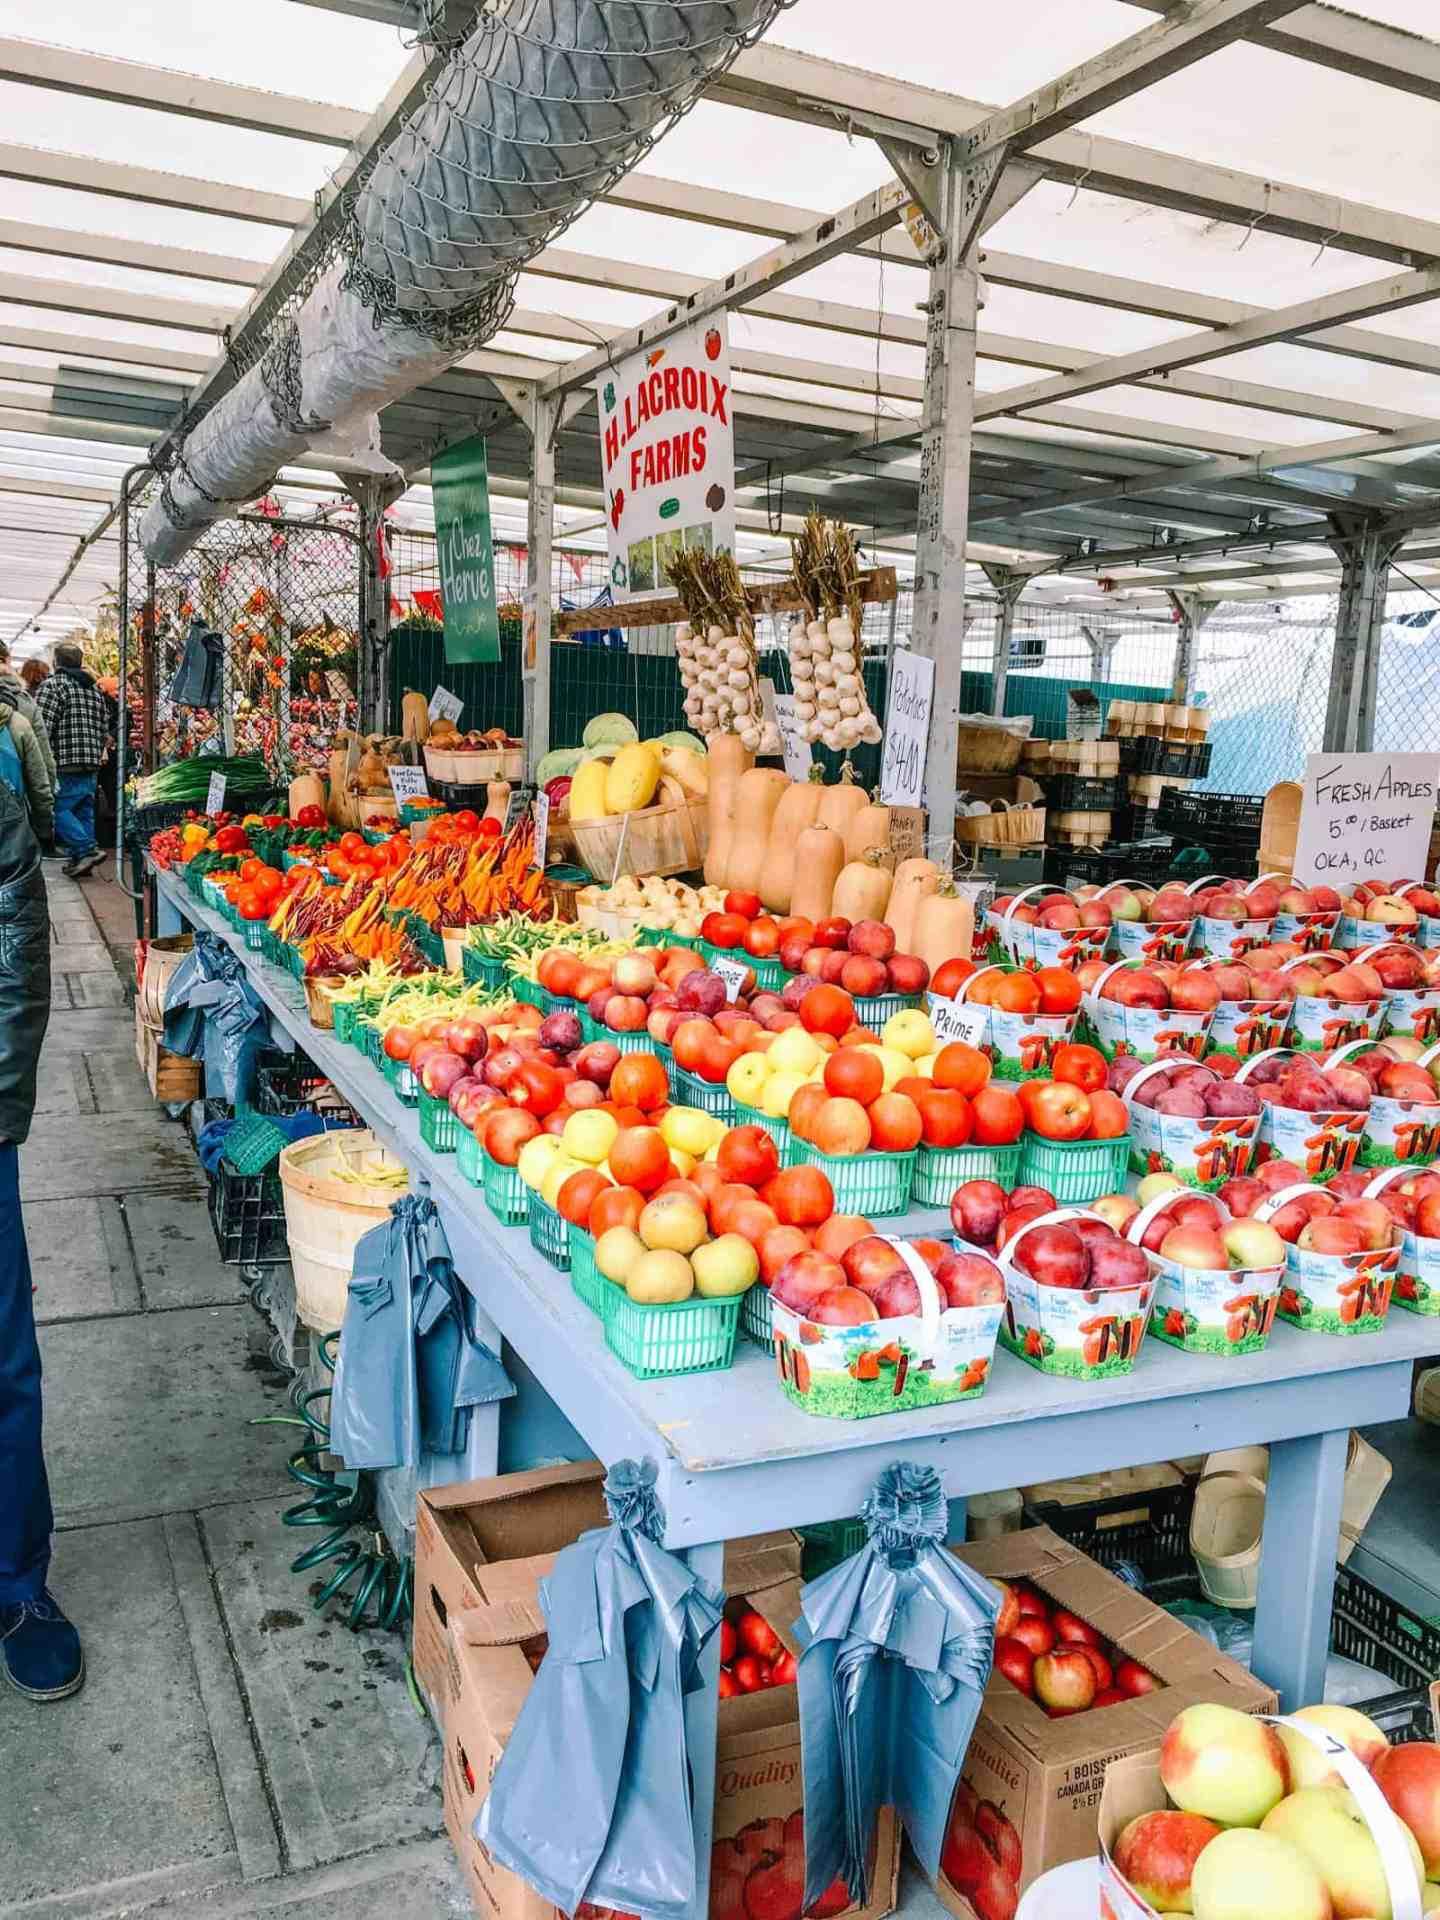 Ottawa travel, Fruit stand at ByWard Market, Ottawa